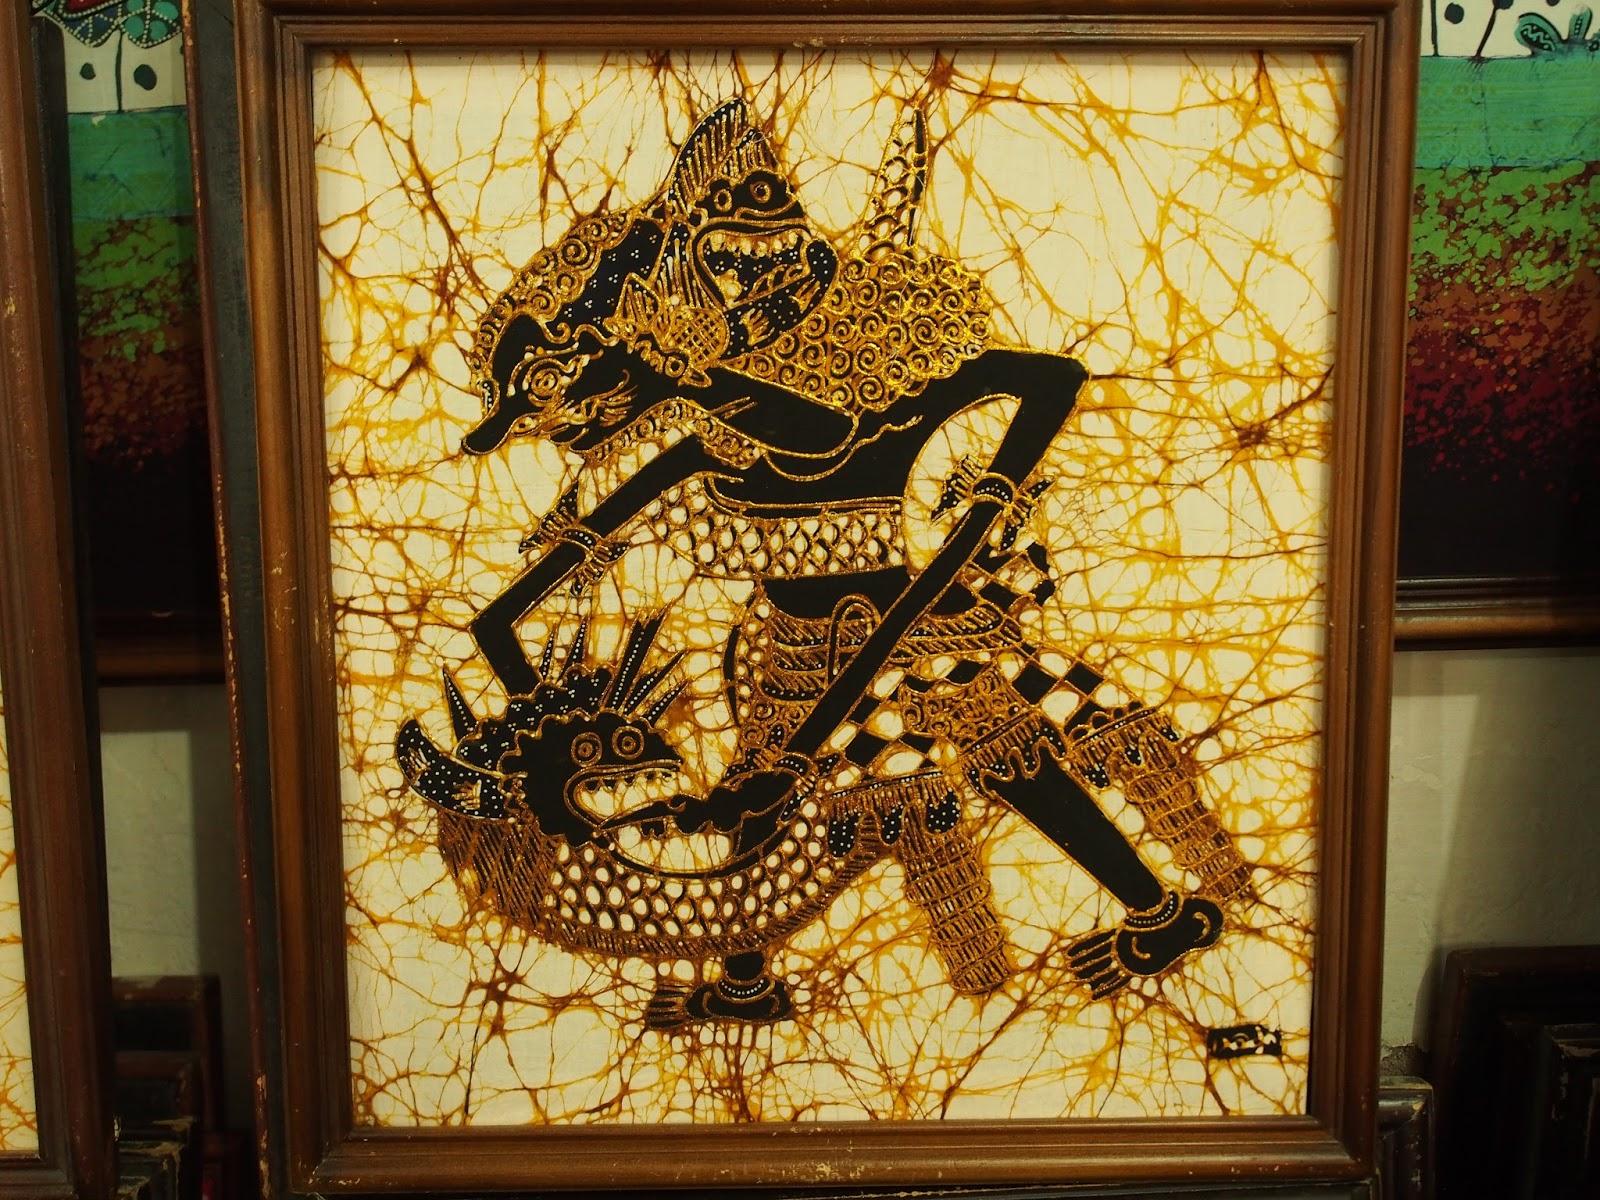 Batik Art and Painting @ Hery\'s | Memoirs of a Traveller